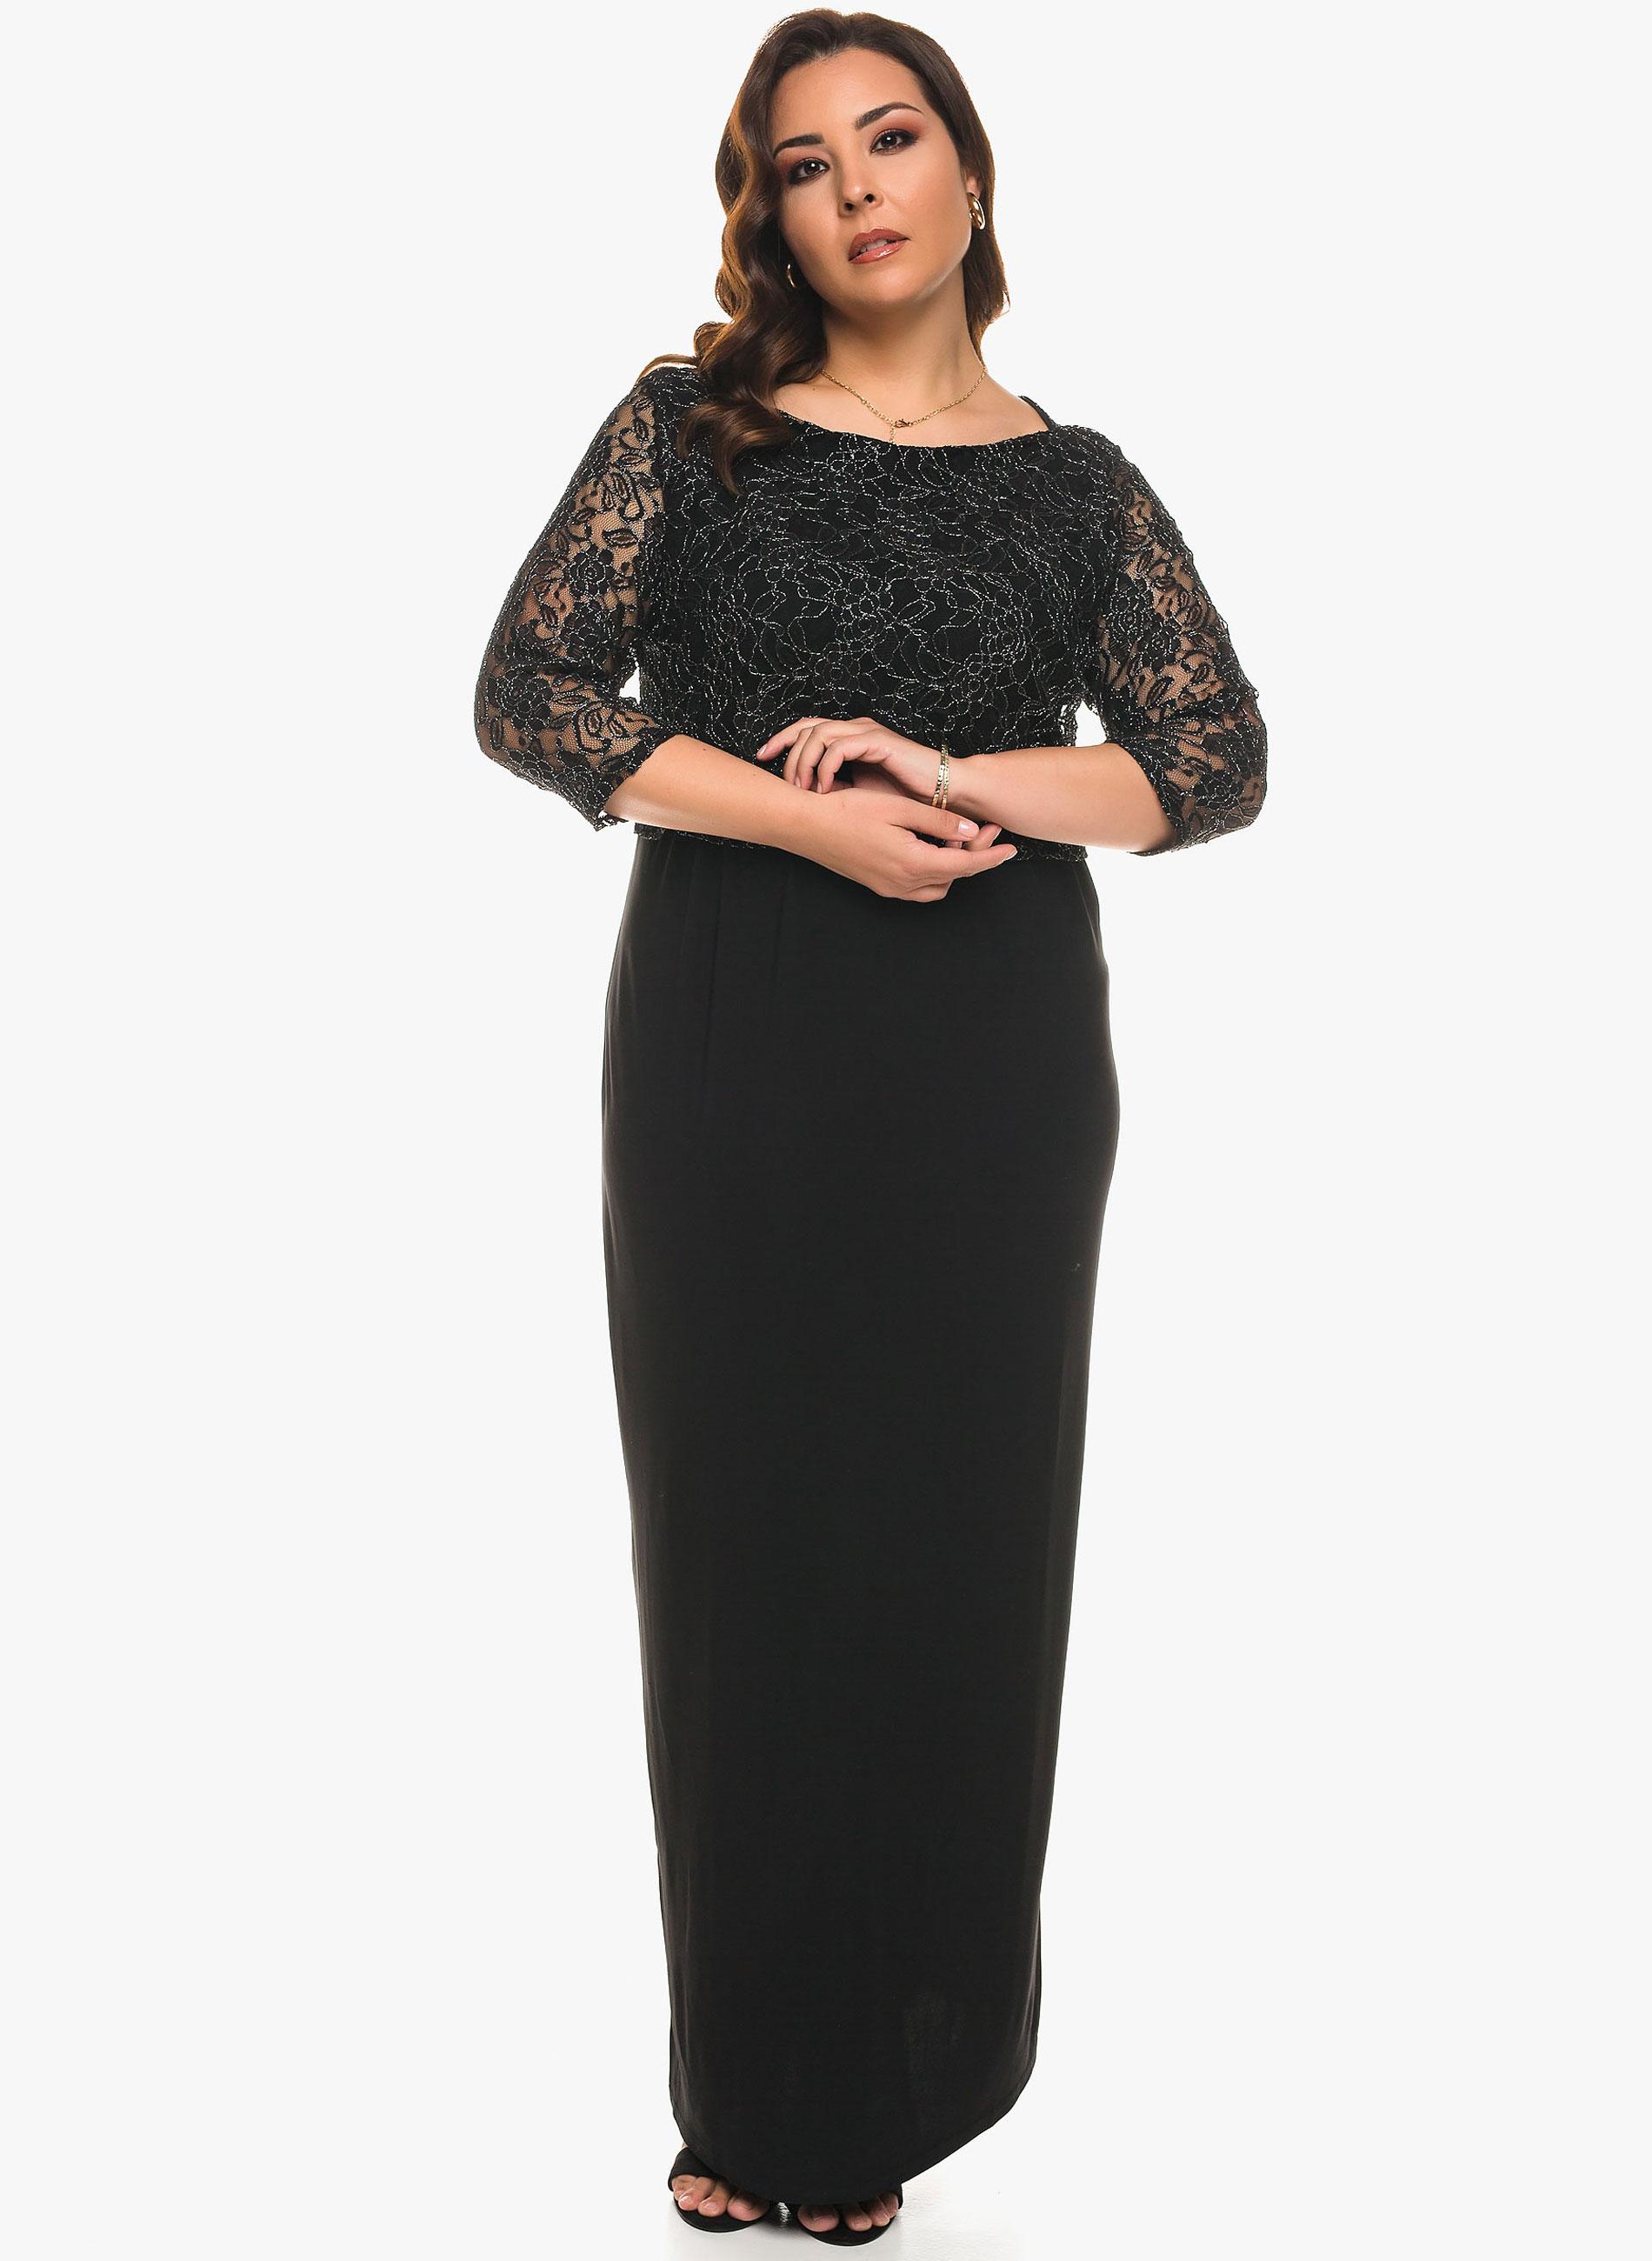 7e156d4305d2 ΜΕΓΑΛΑ ΜΕΓΕΘΗ ΦΟΡΕΜΑΤΑ    Μάξι Φόρεμα με Μεταλλική Δαντέλα - Μόδα σε ...